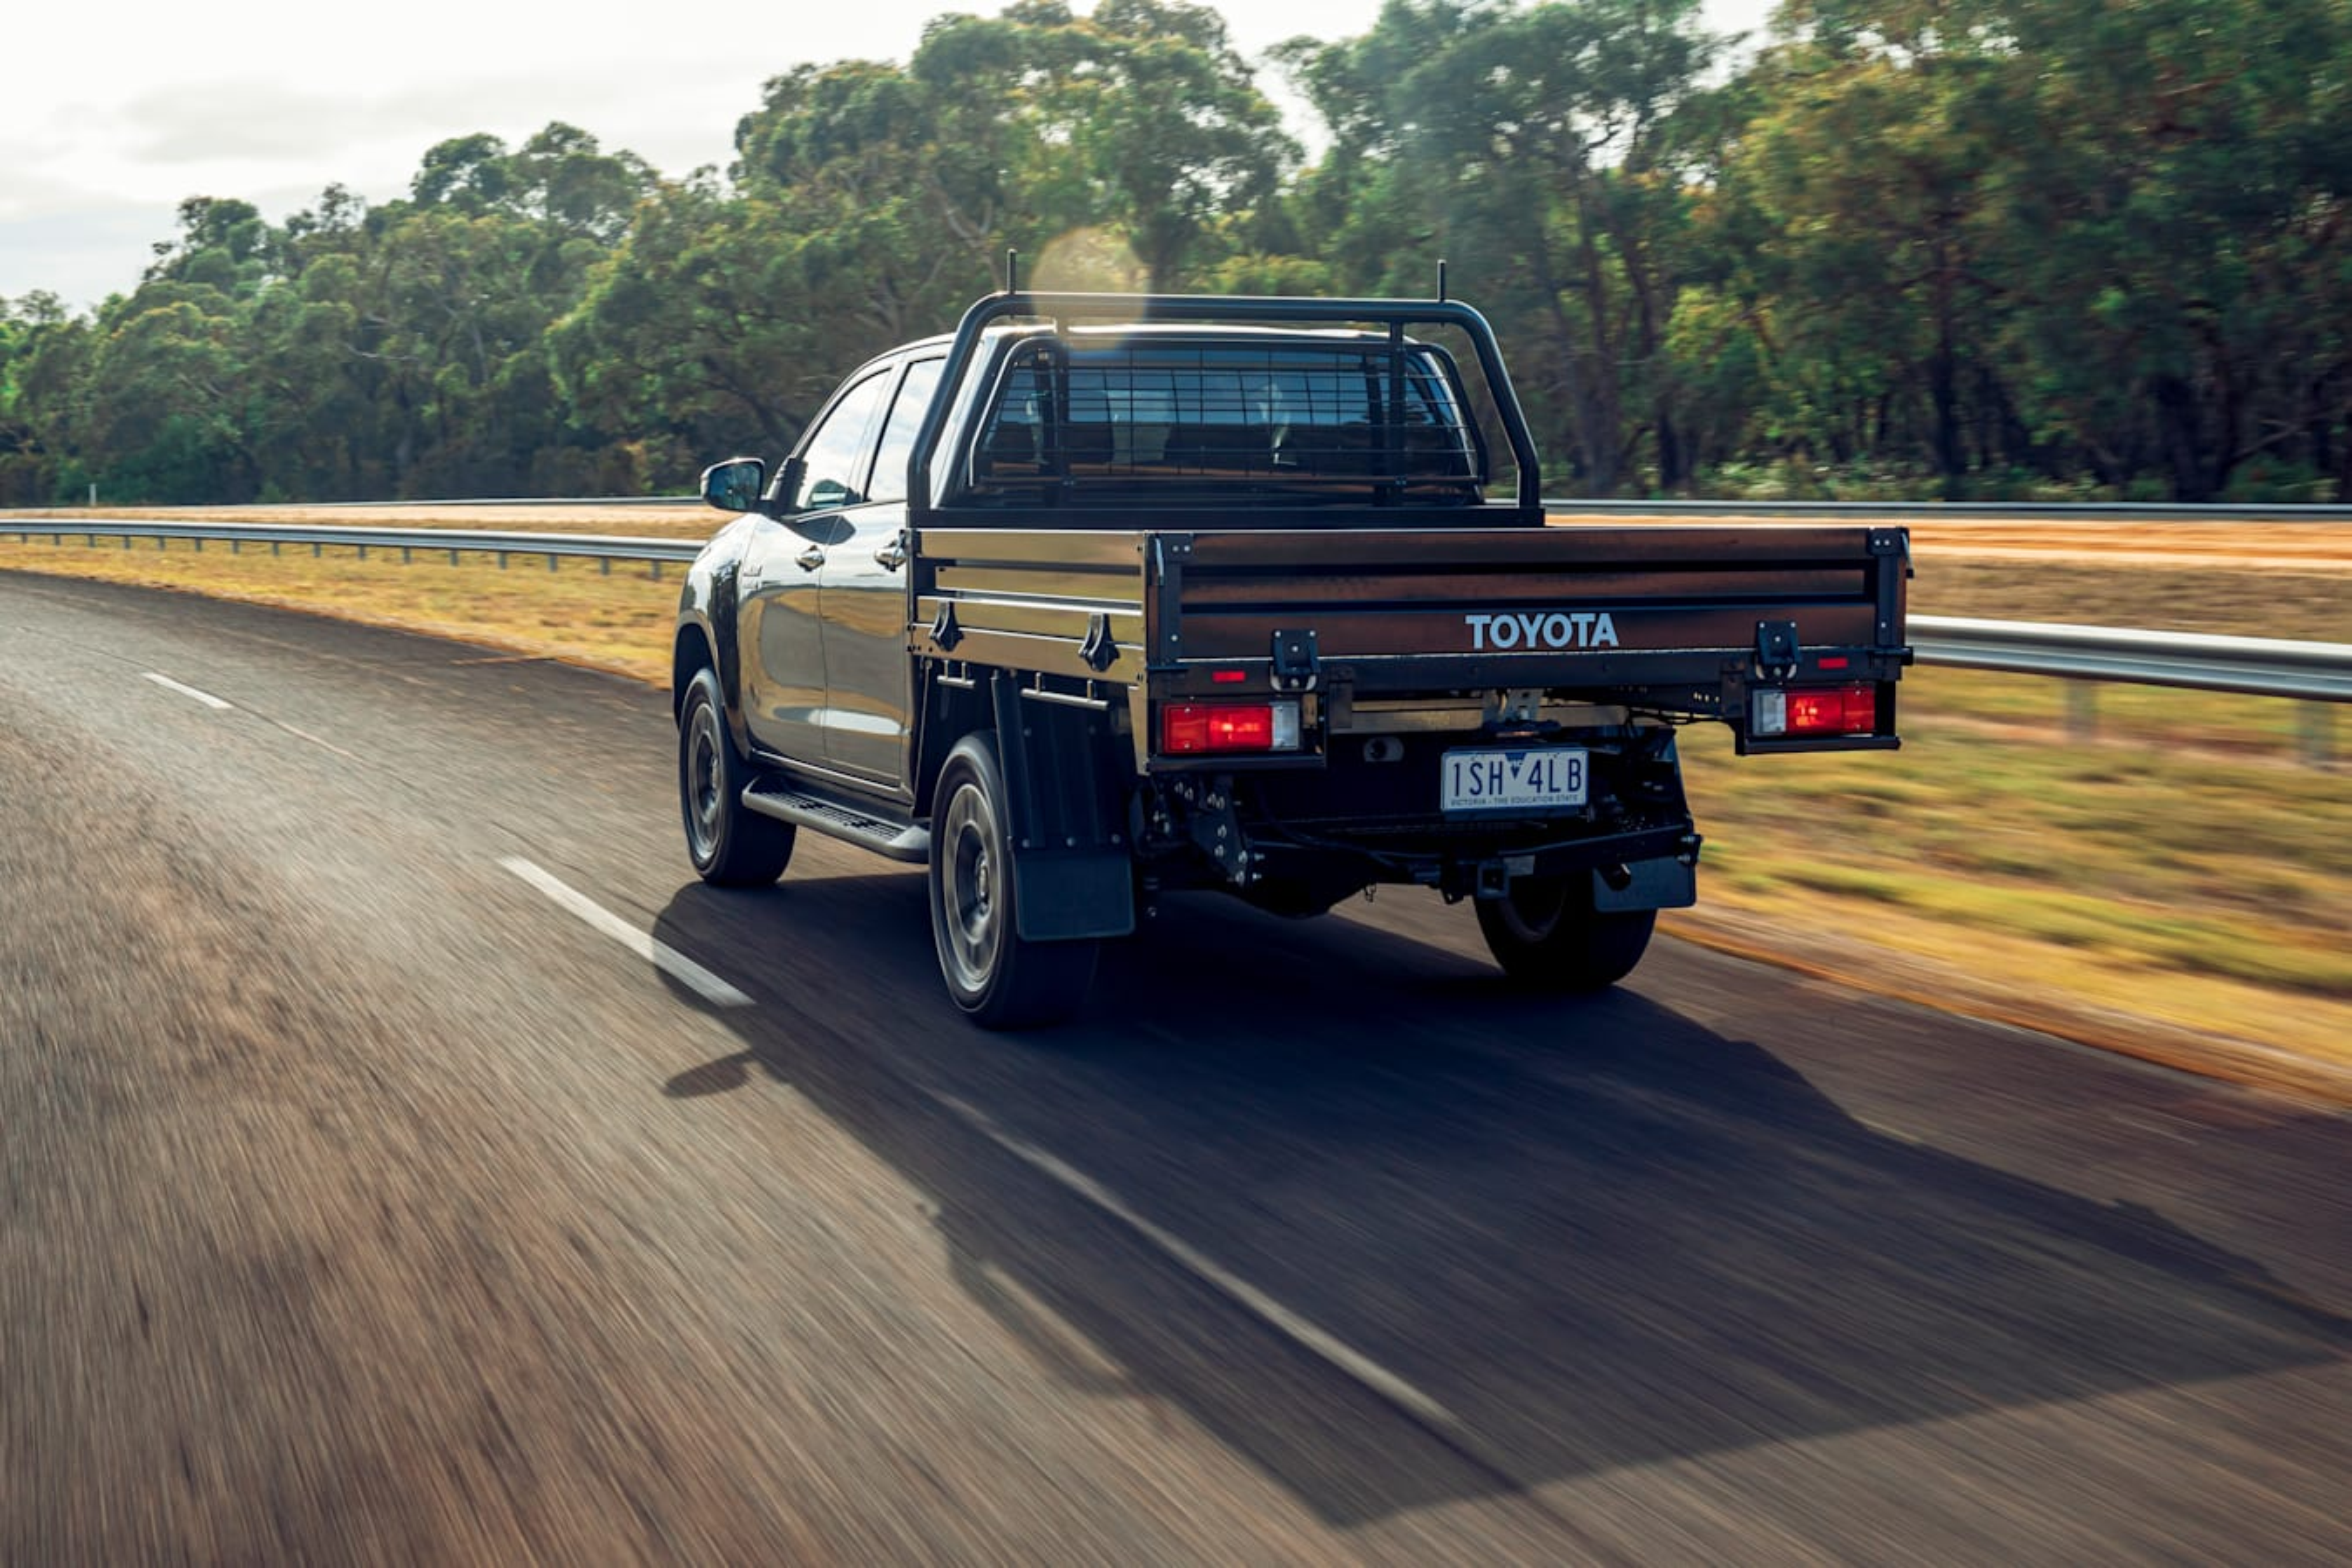 4 X 4 Australia Comparisons 2021 May 21 Toyota Hilux SR 5 Drive Review